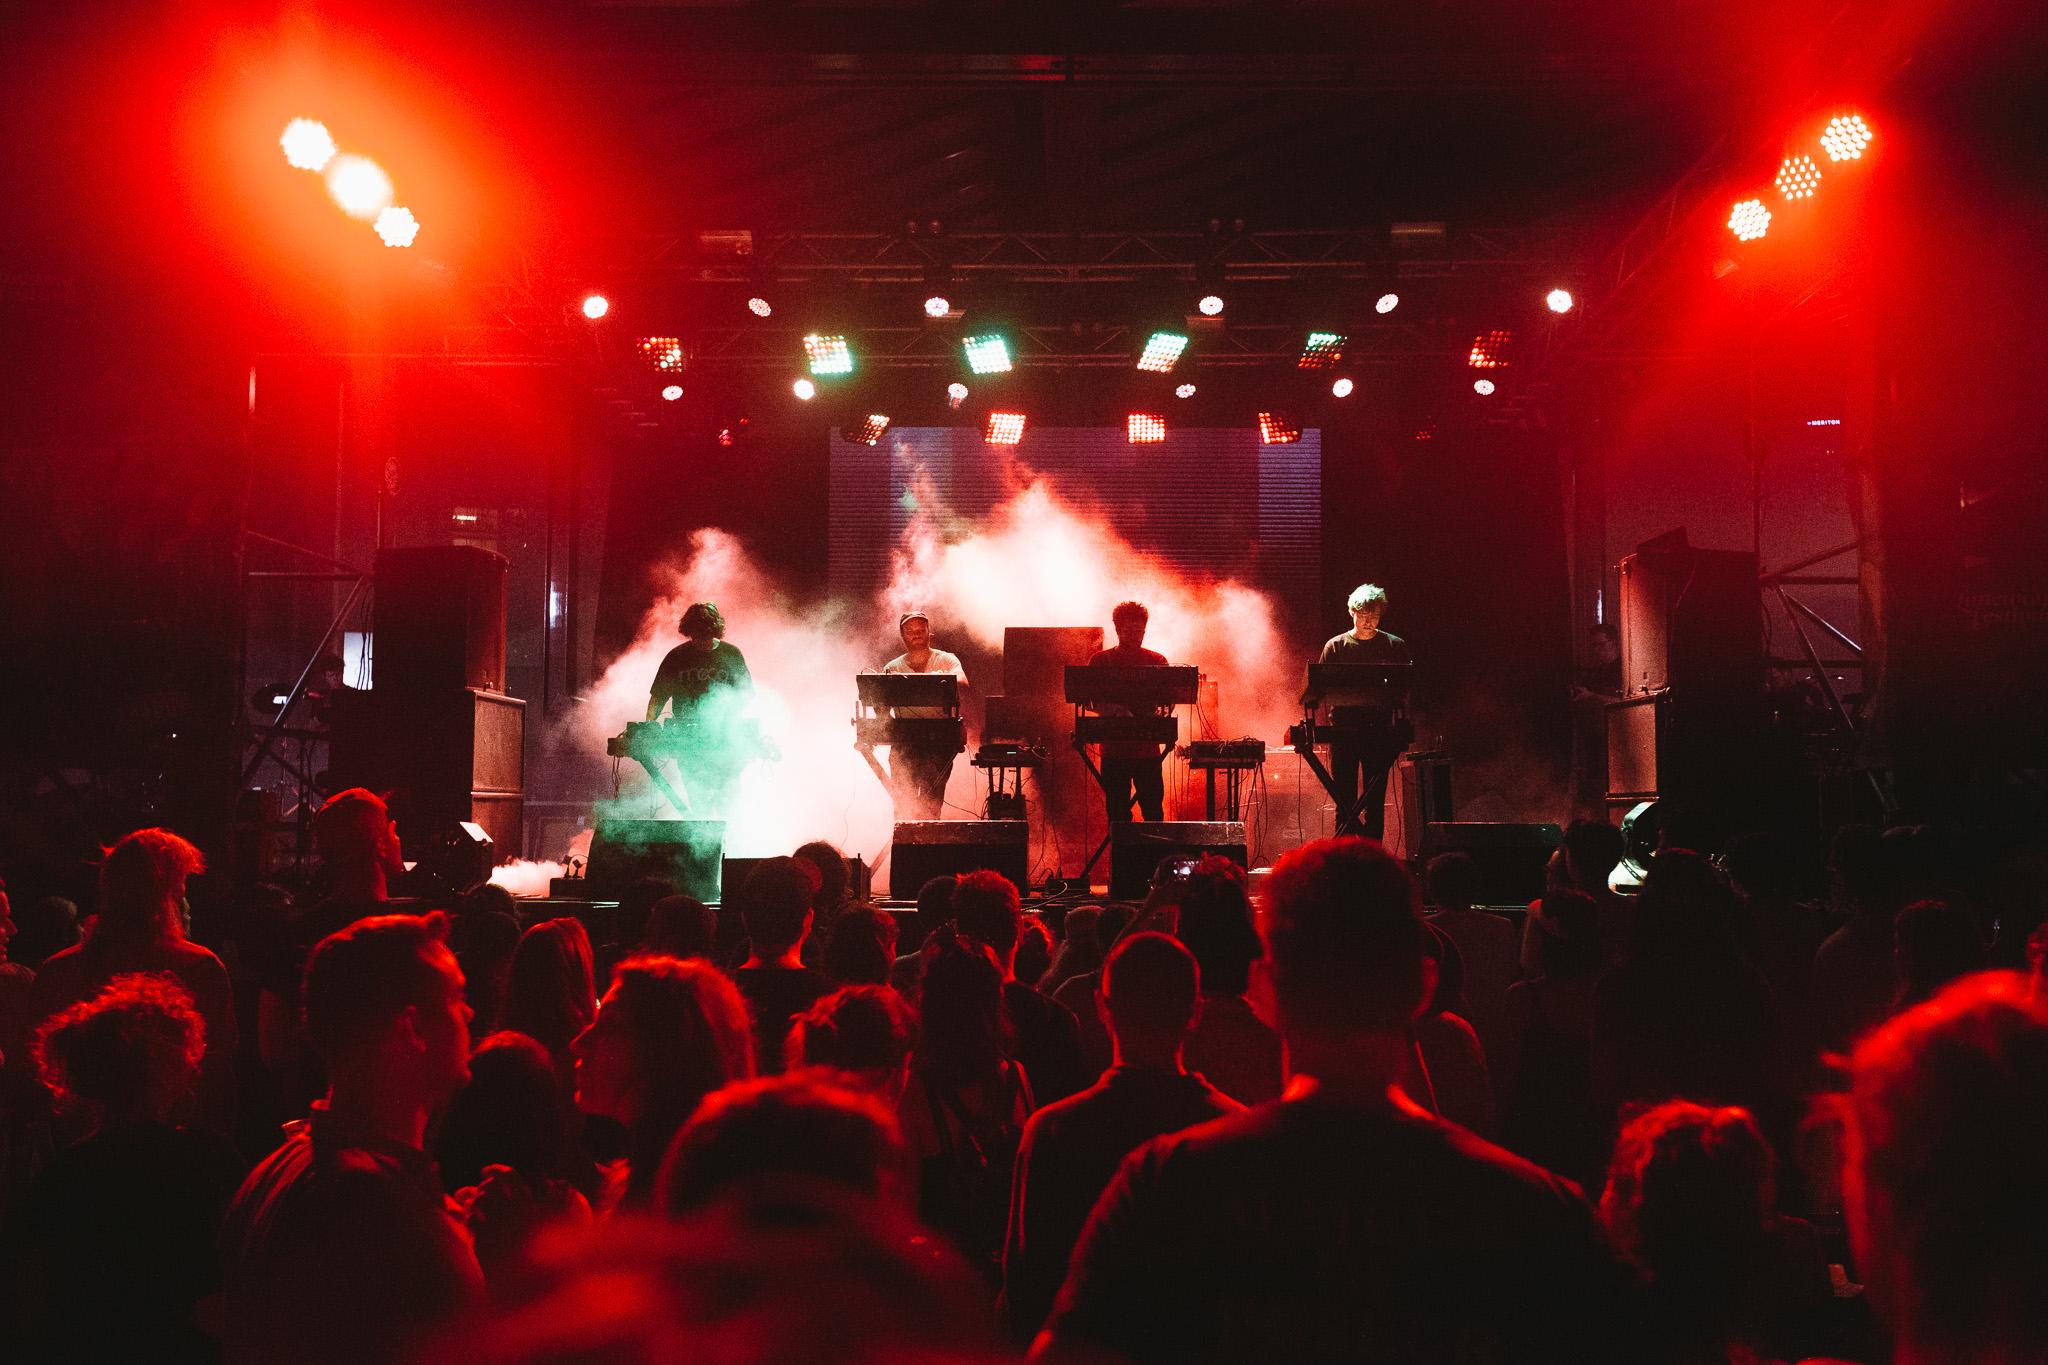 SURVIVE_Laneway-Festival-Brisbane-2018_Credit-Bianca-Holderness-1.jpg